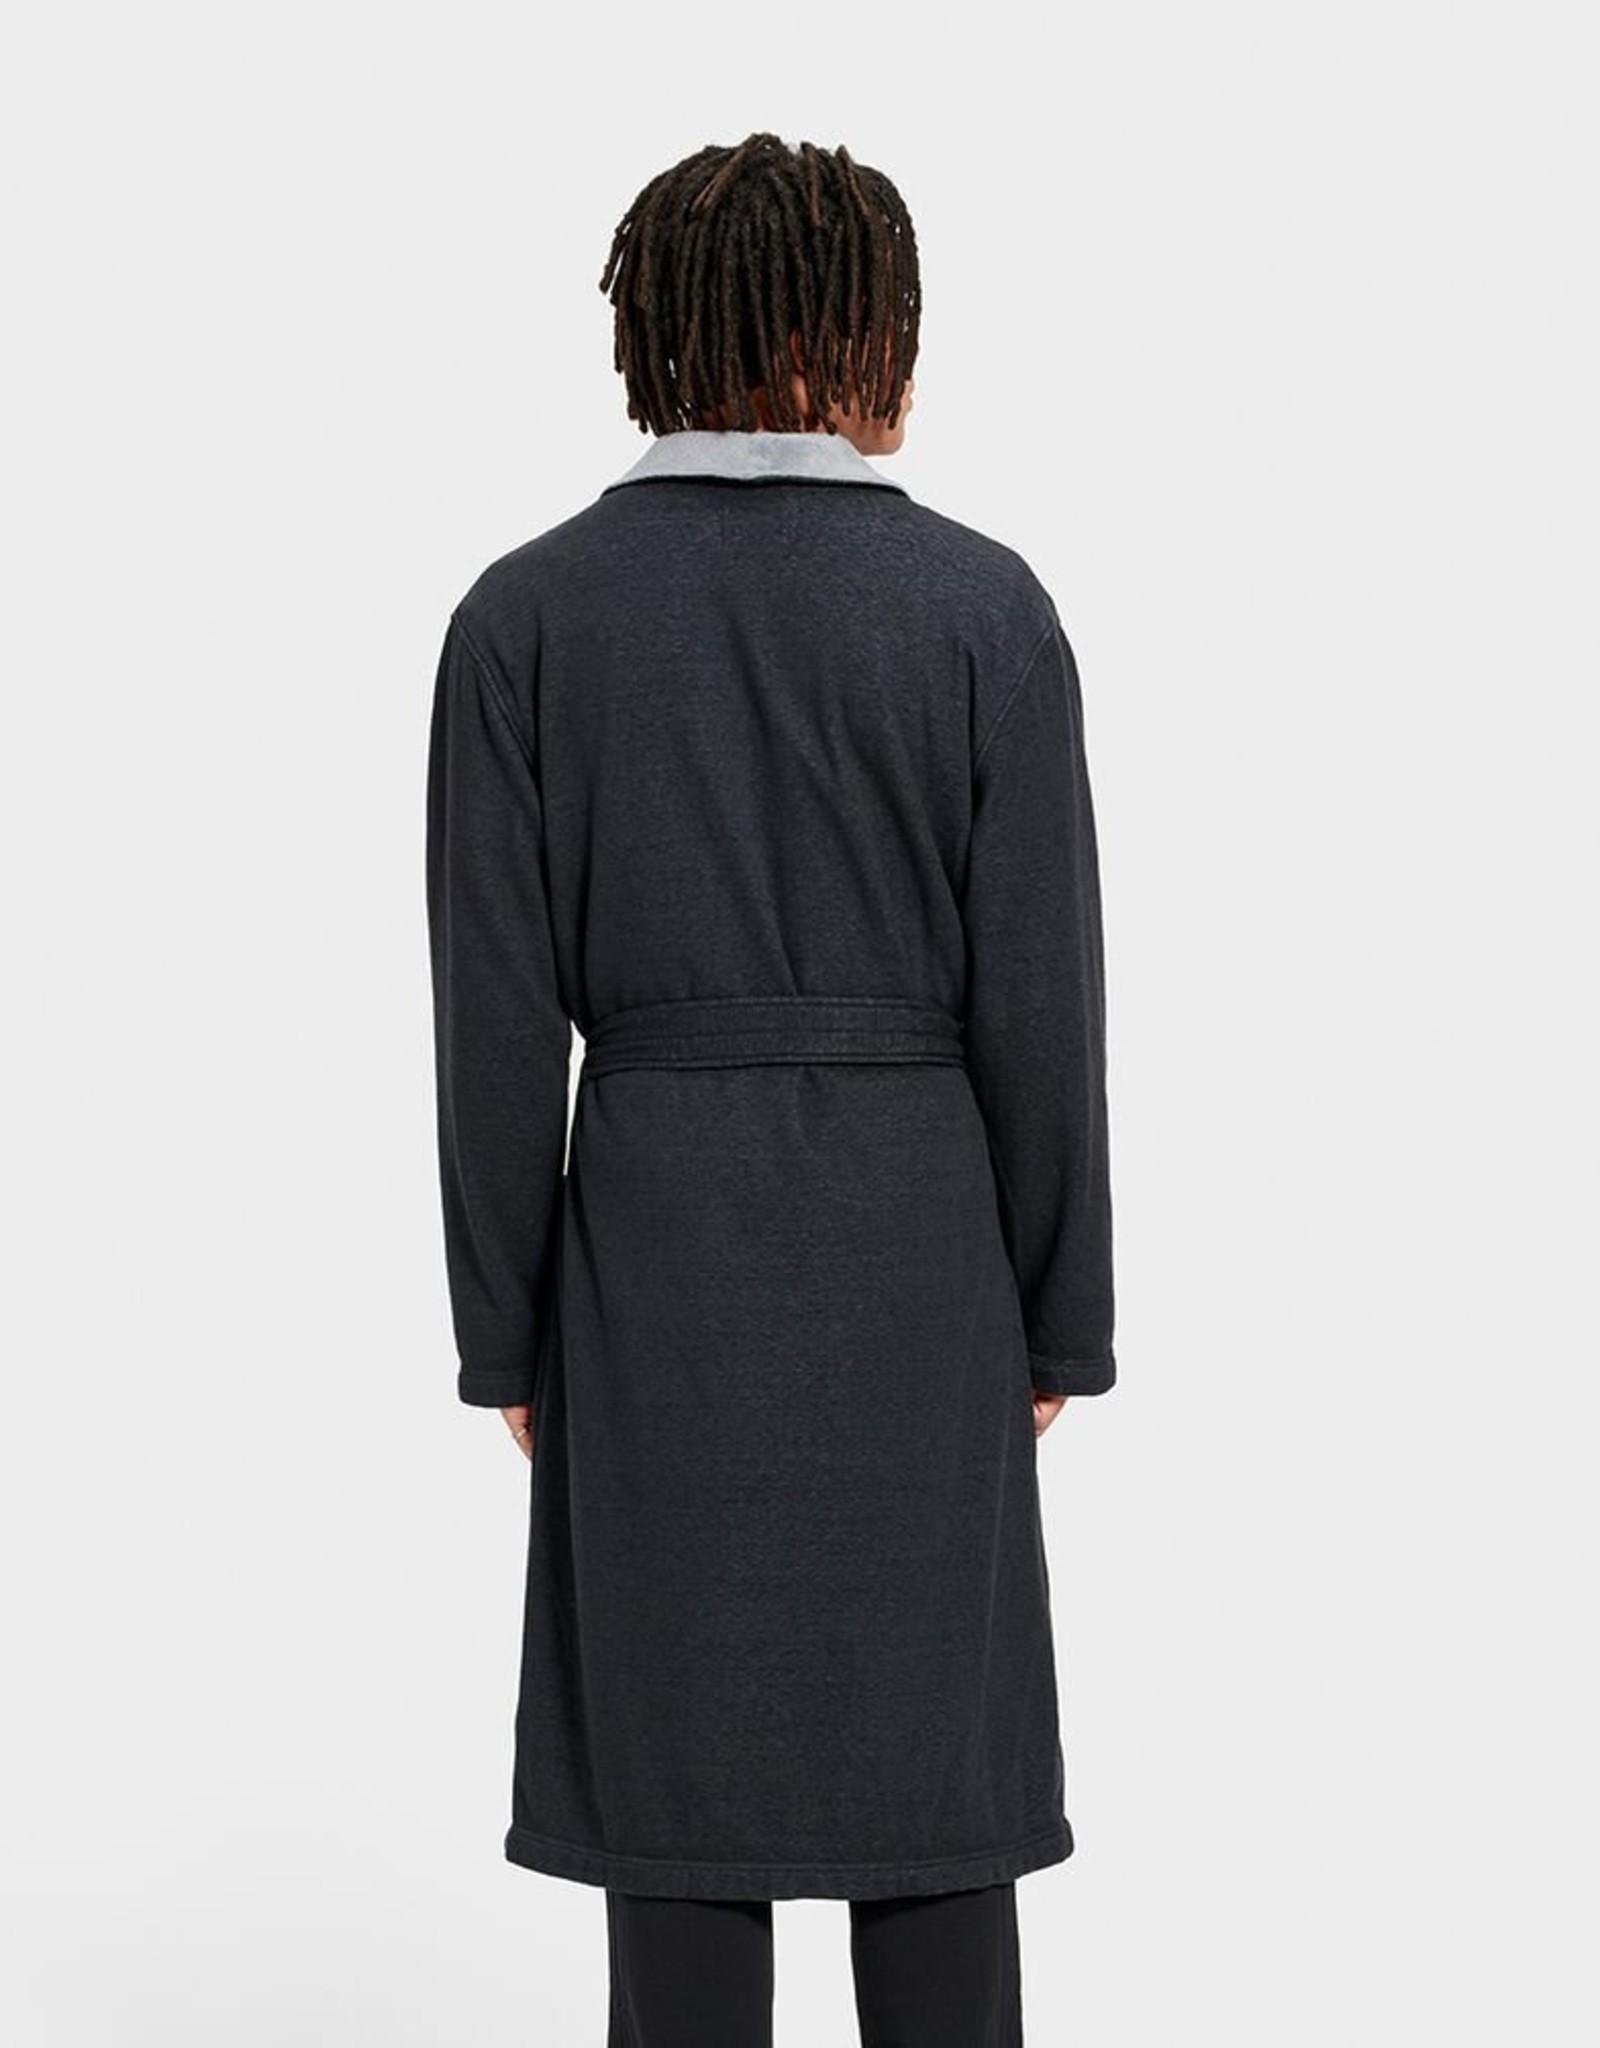 UGG - Men's Robinson Robe Black Heather